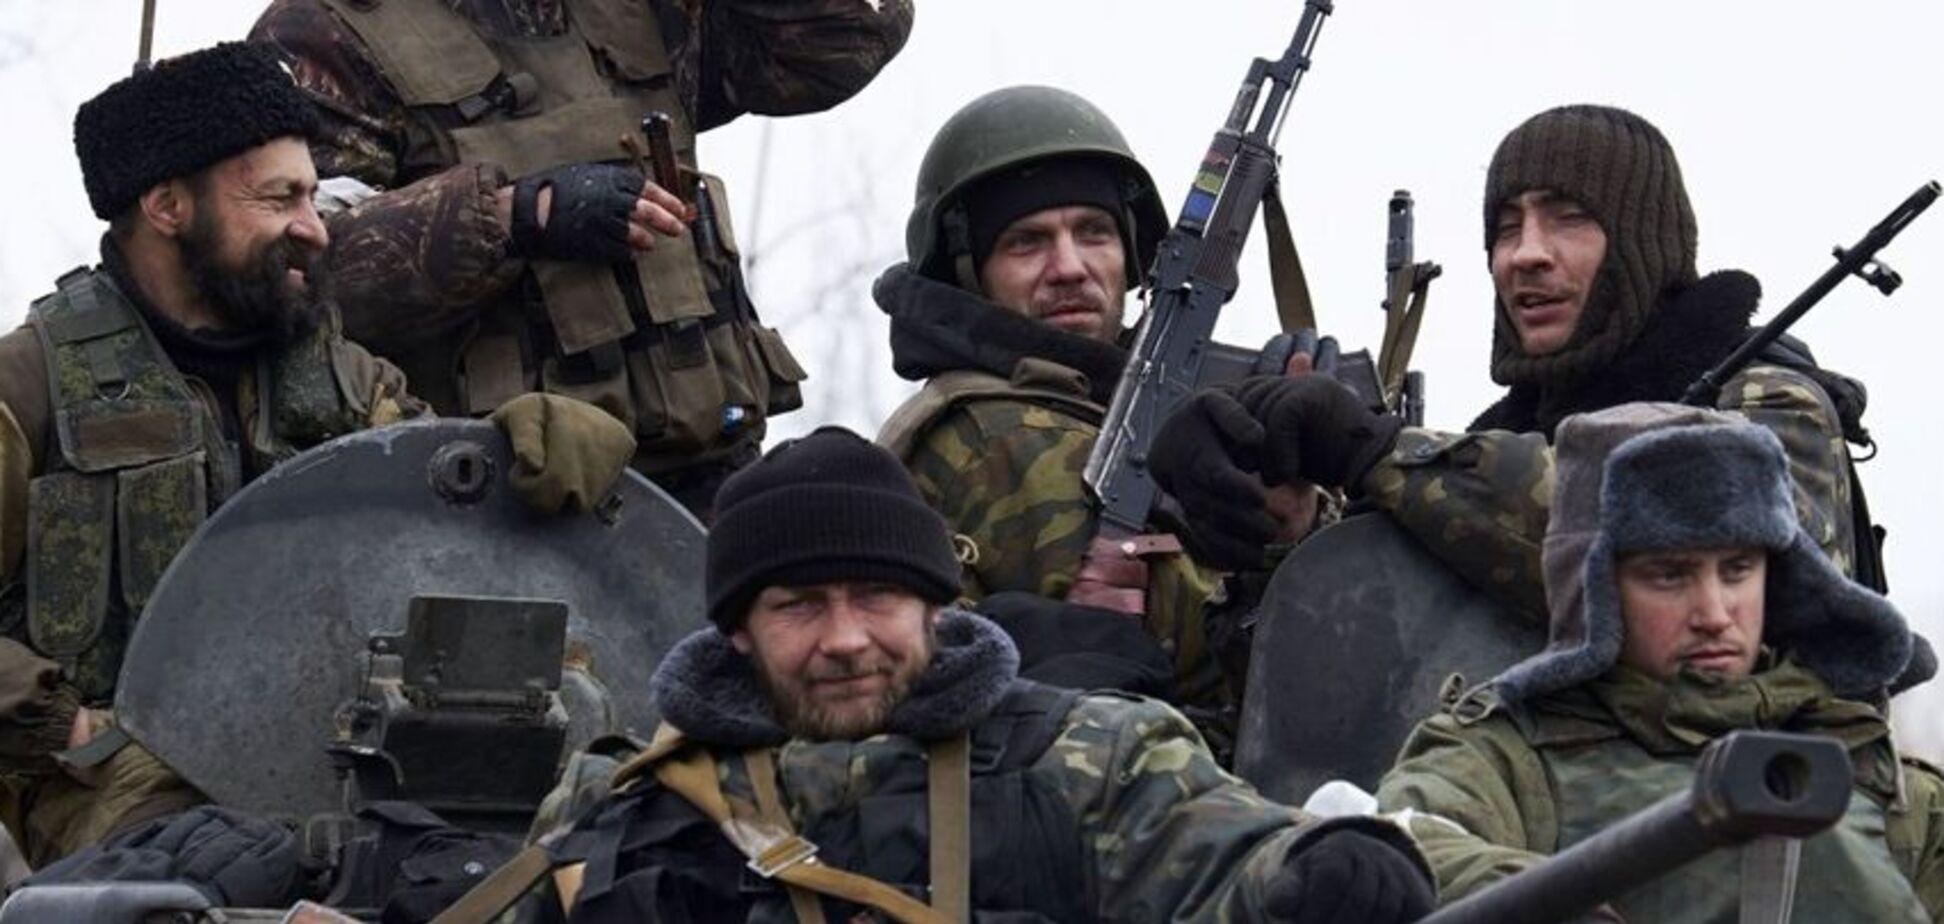 Терористи Л/ДНР